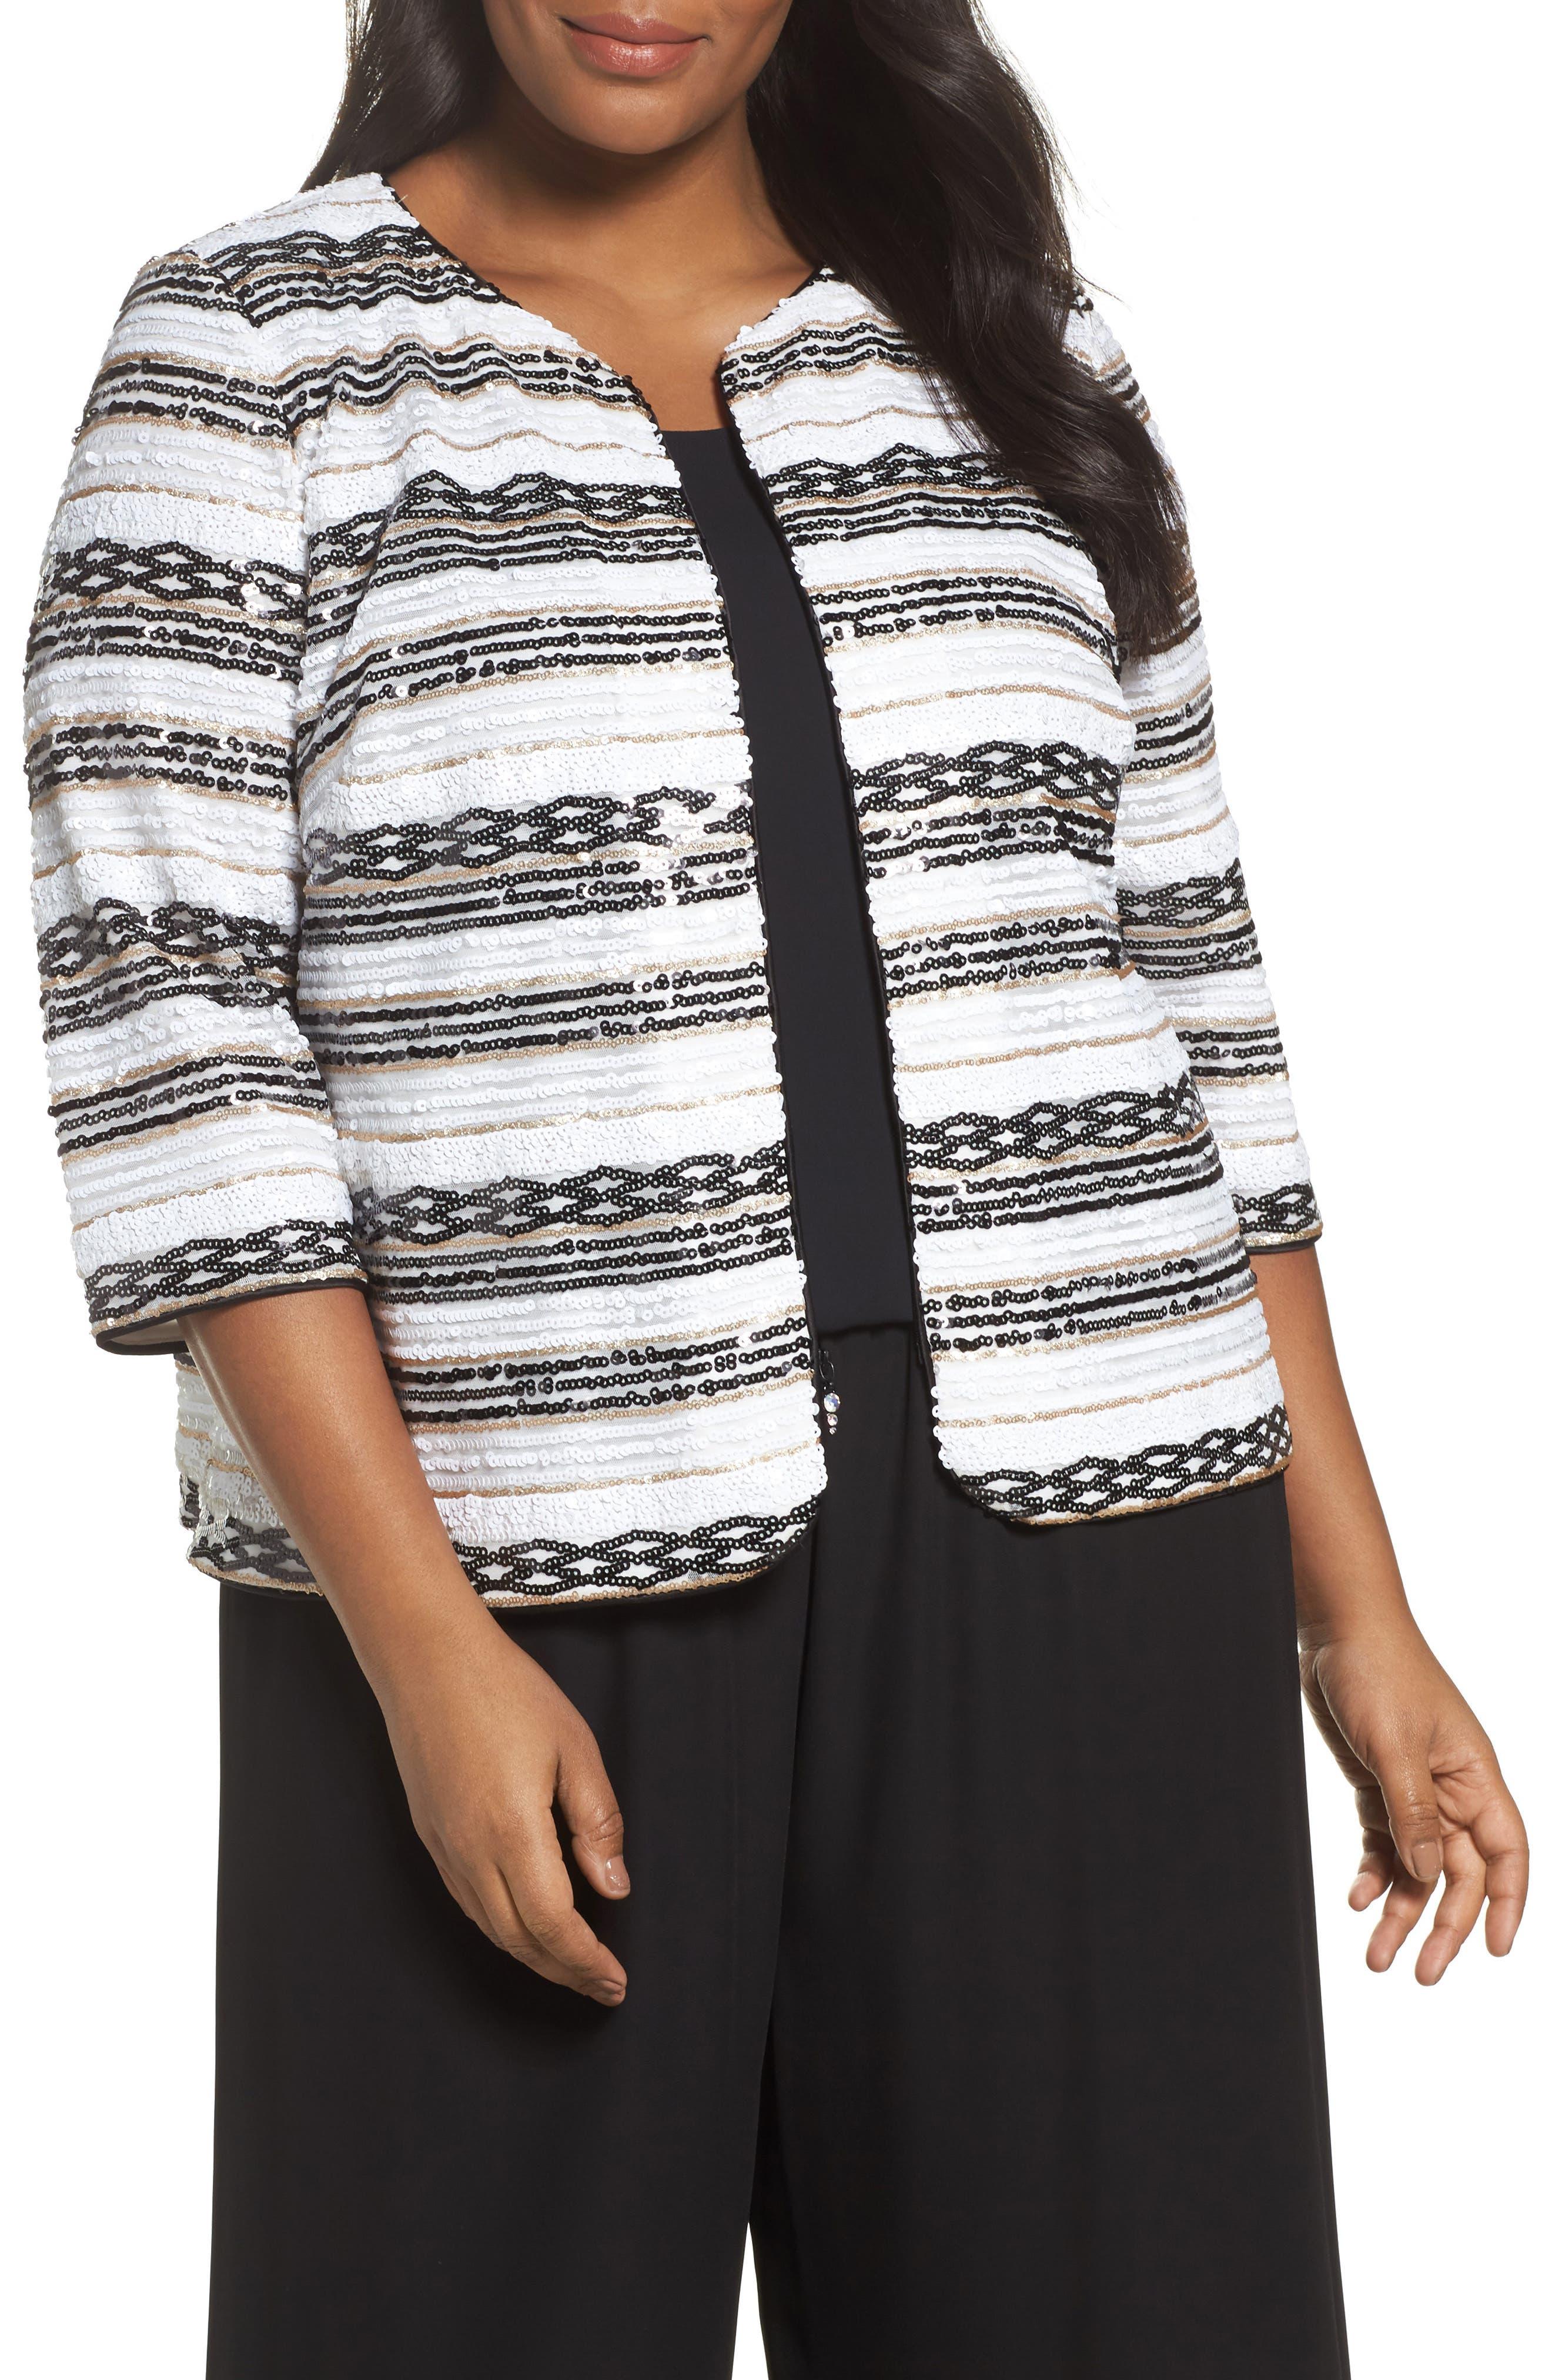 Sequin Stripe Jacket,                             Main thumbnail 1, color,                             White/ Black